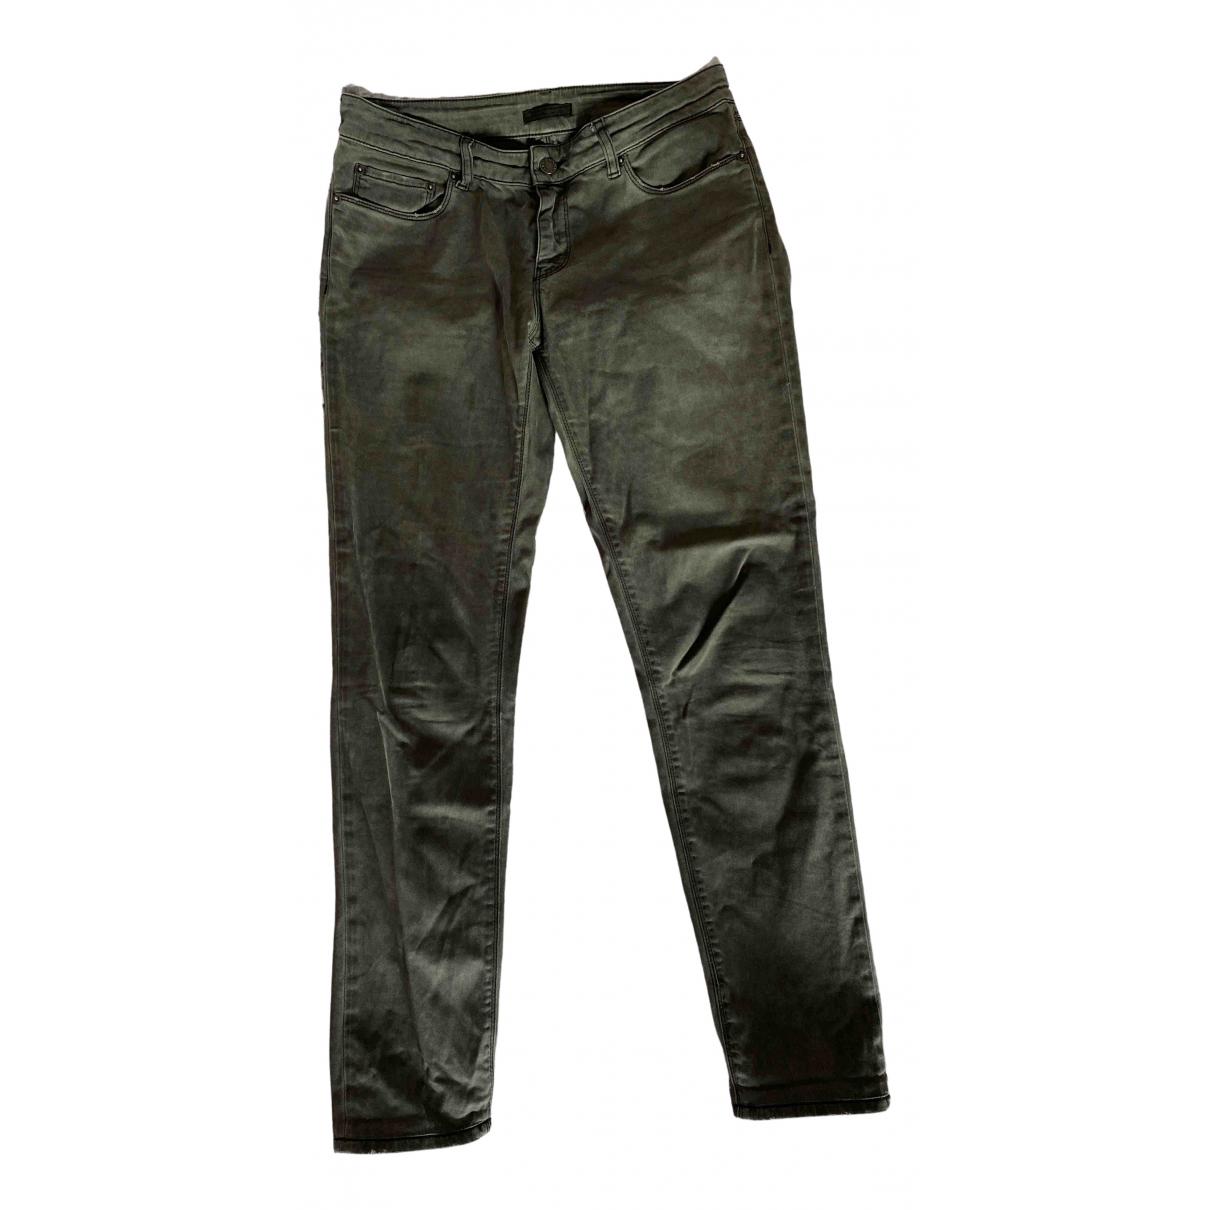 Prada N Grey Cotton Jeans for Women 27 US